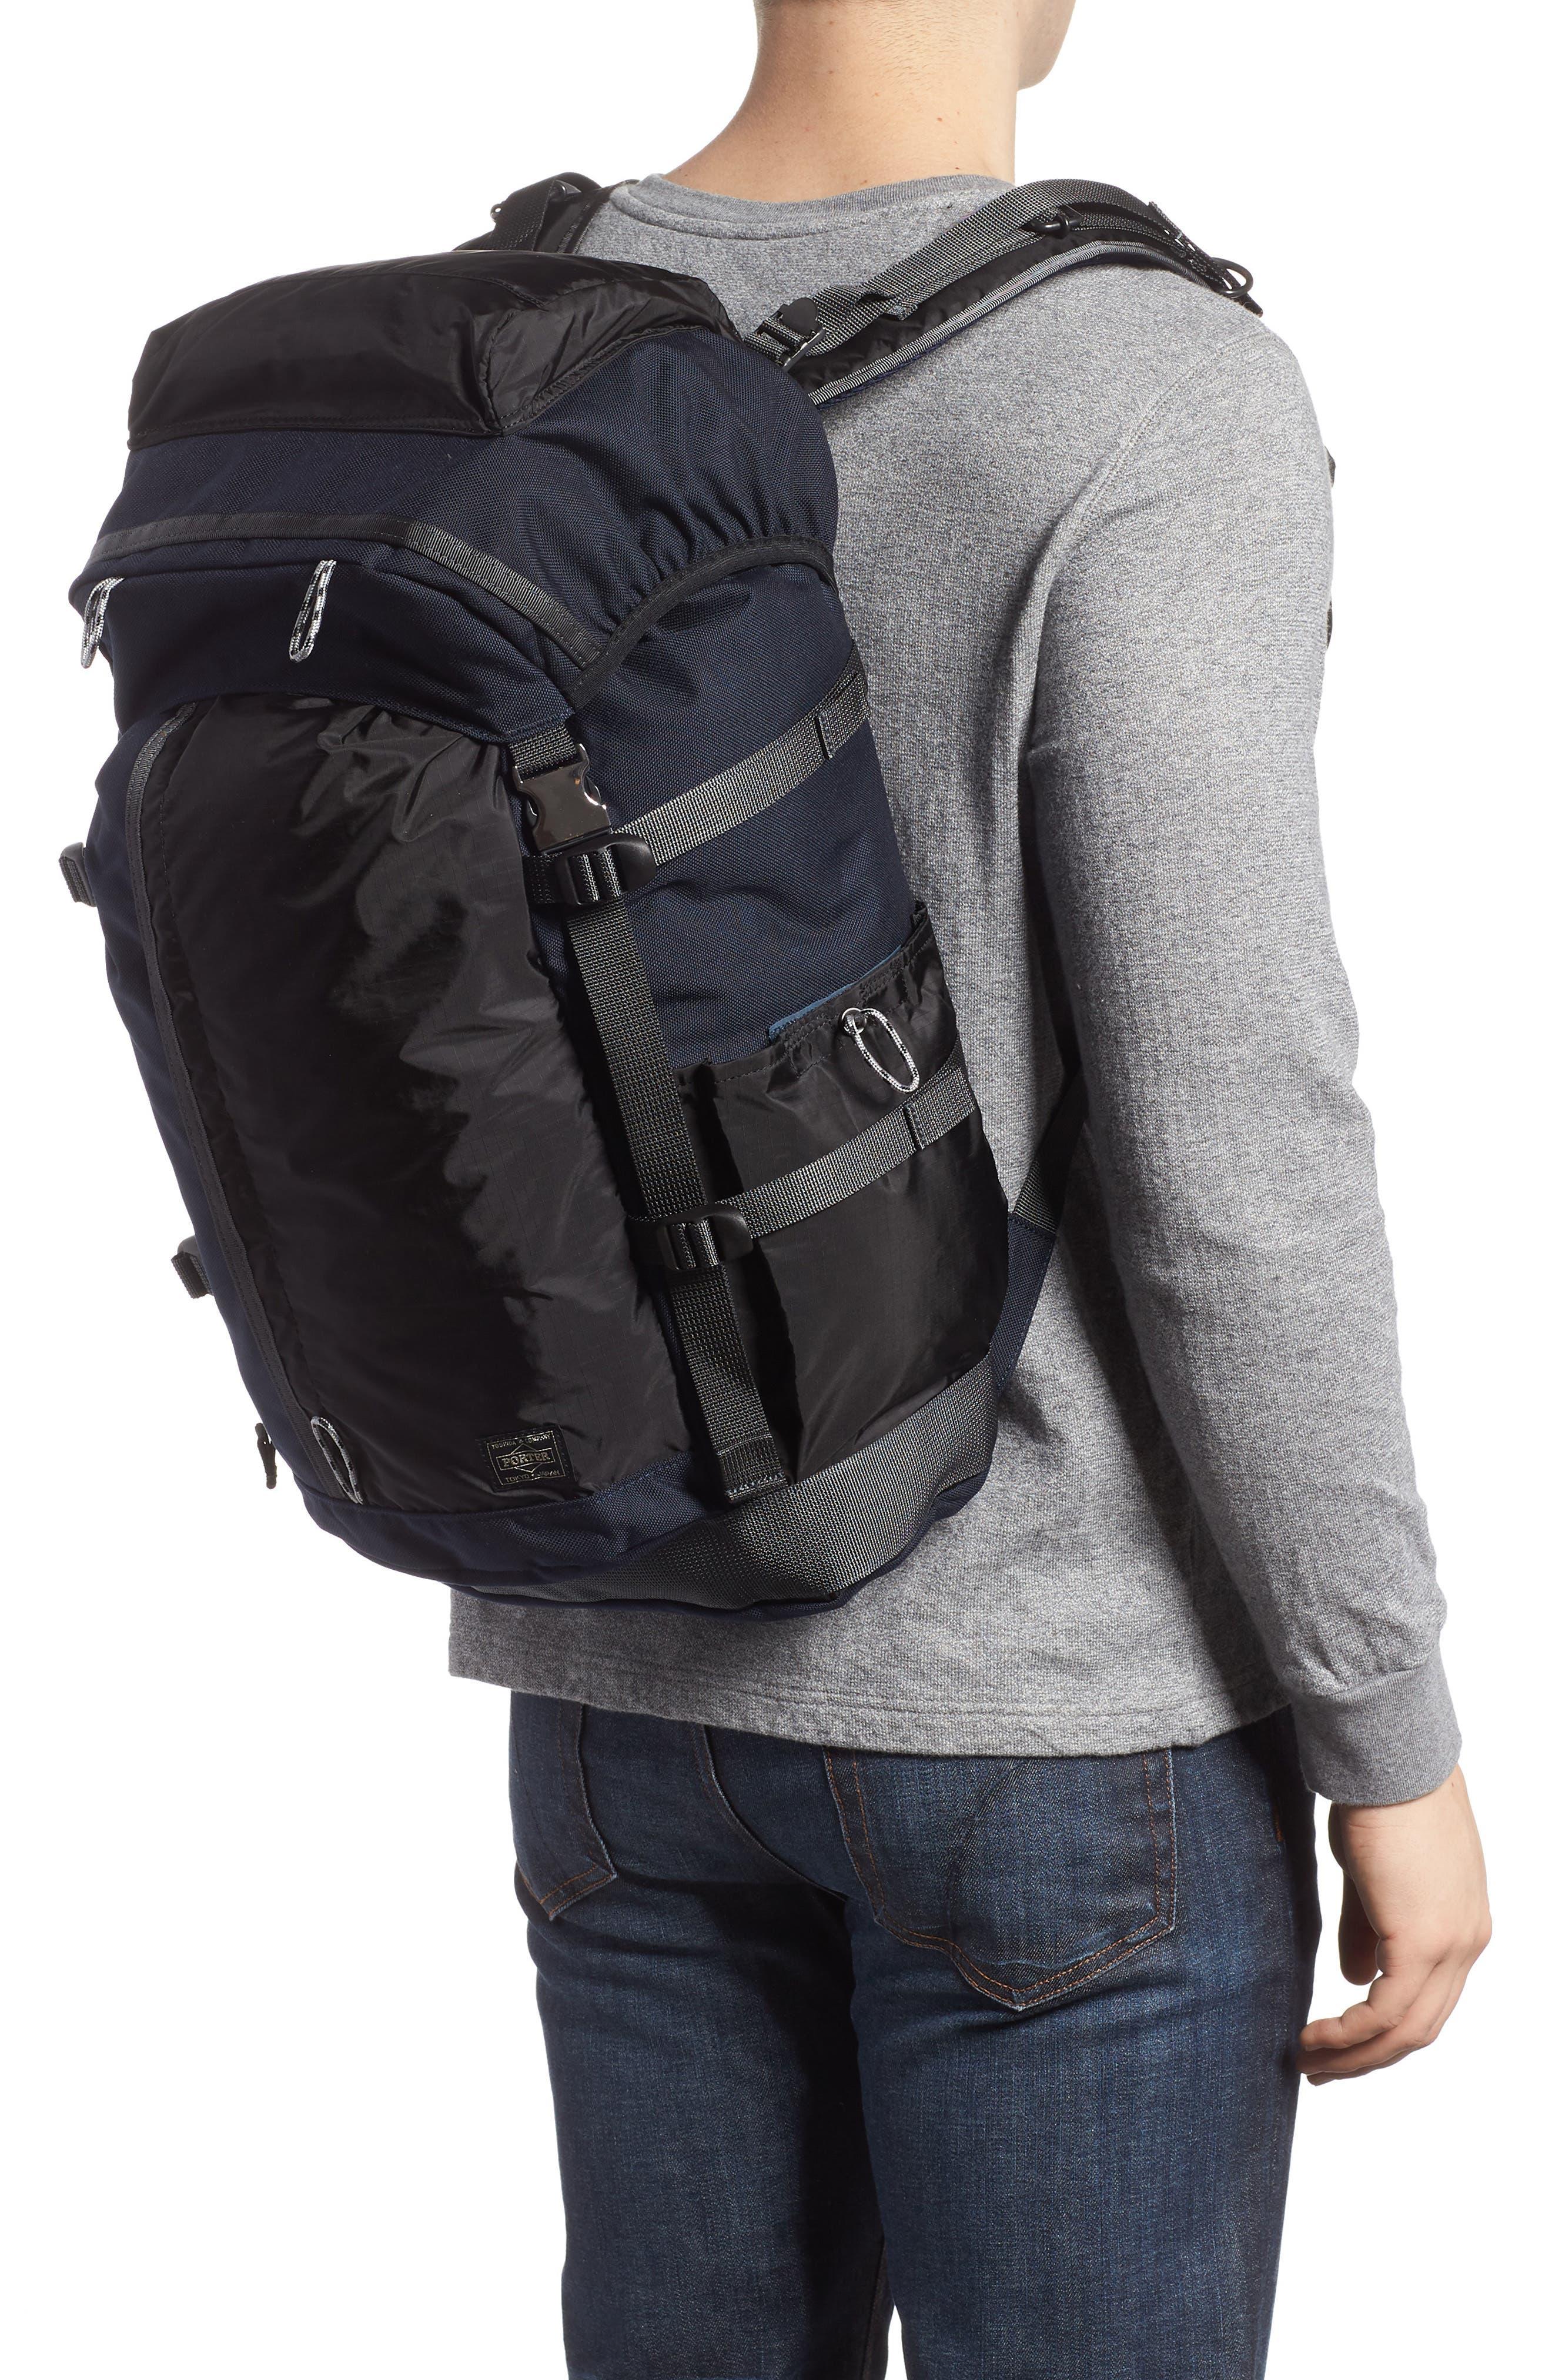 Porter-Yoshida & Co. Hype Backpack,                             Alternate thumbnail 2, color,                             Navy/ Black